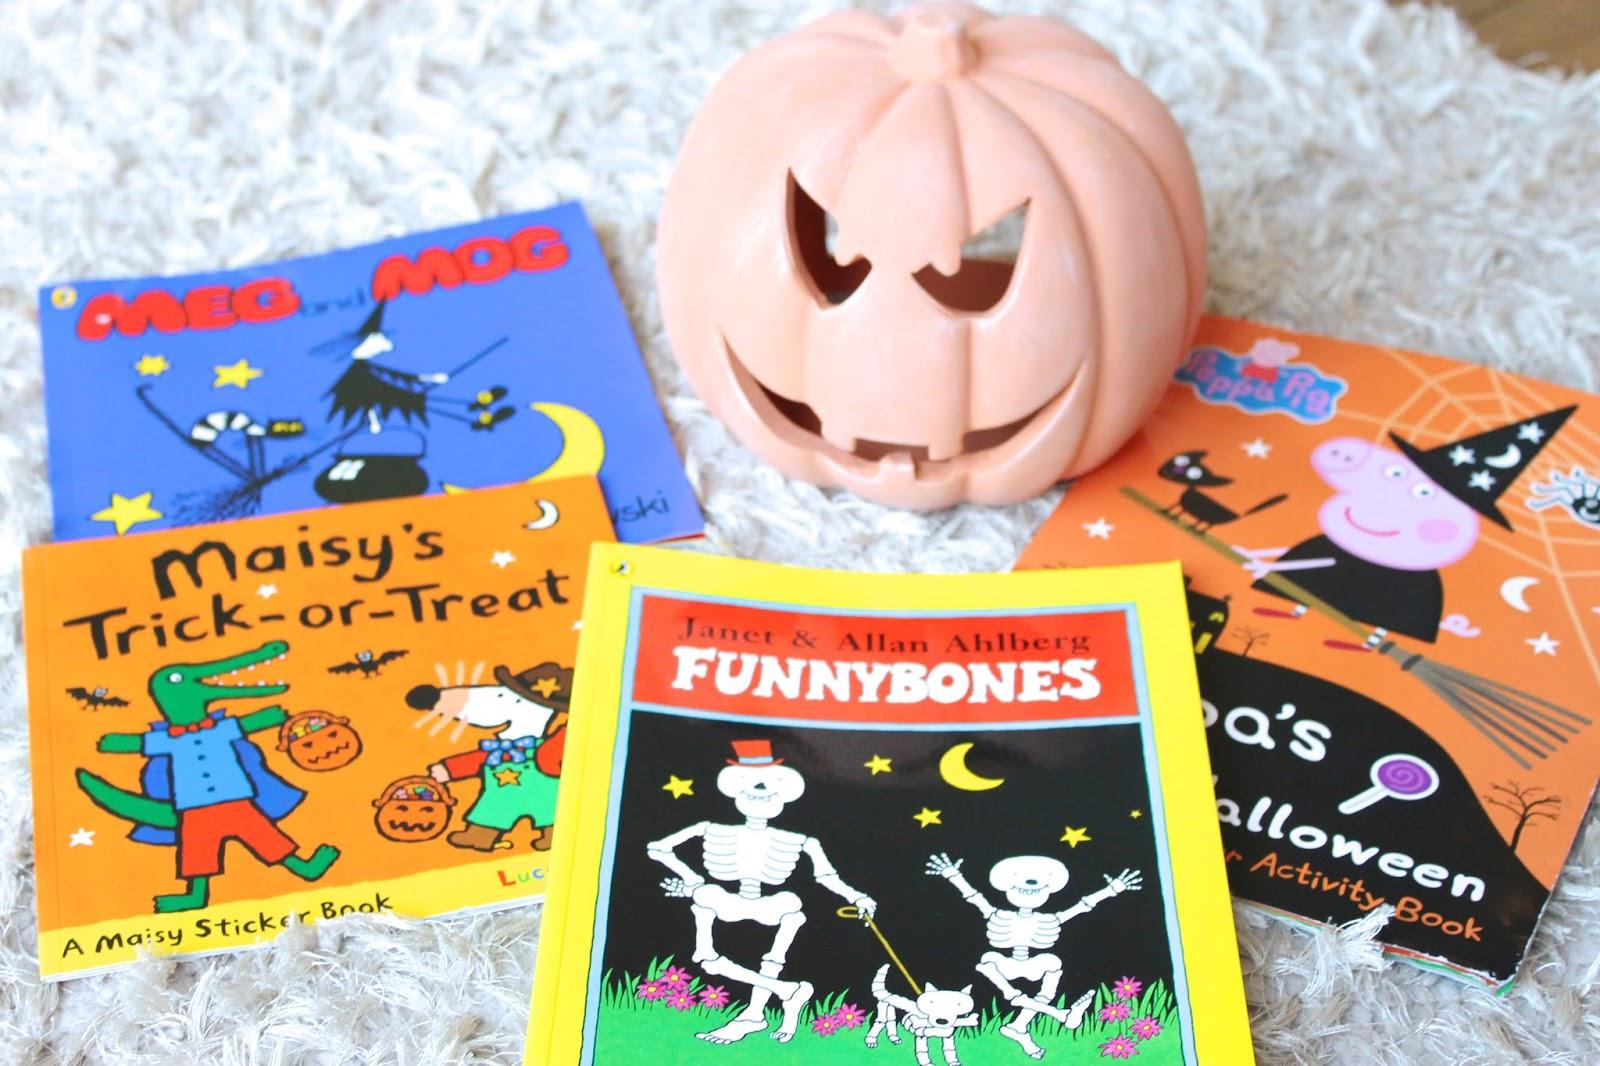 kids books halloween, halloween books, childrens books for halloween, toddler books for halloween